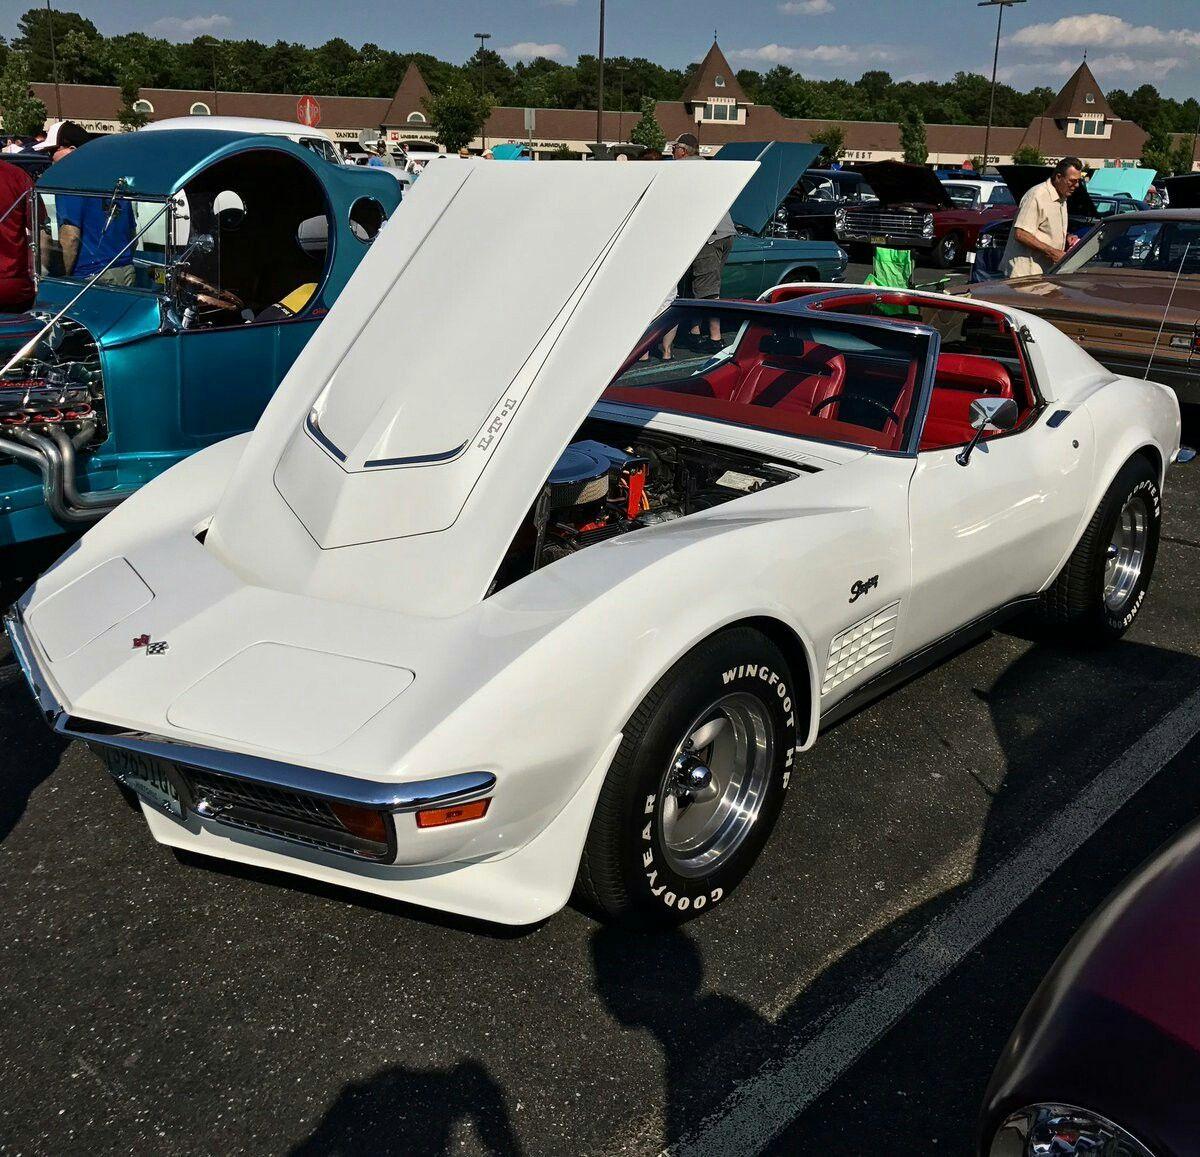 Corvette Lt1 Corvette Chevy Muscle Cars Classic Cars Trucks